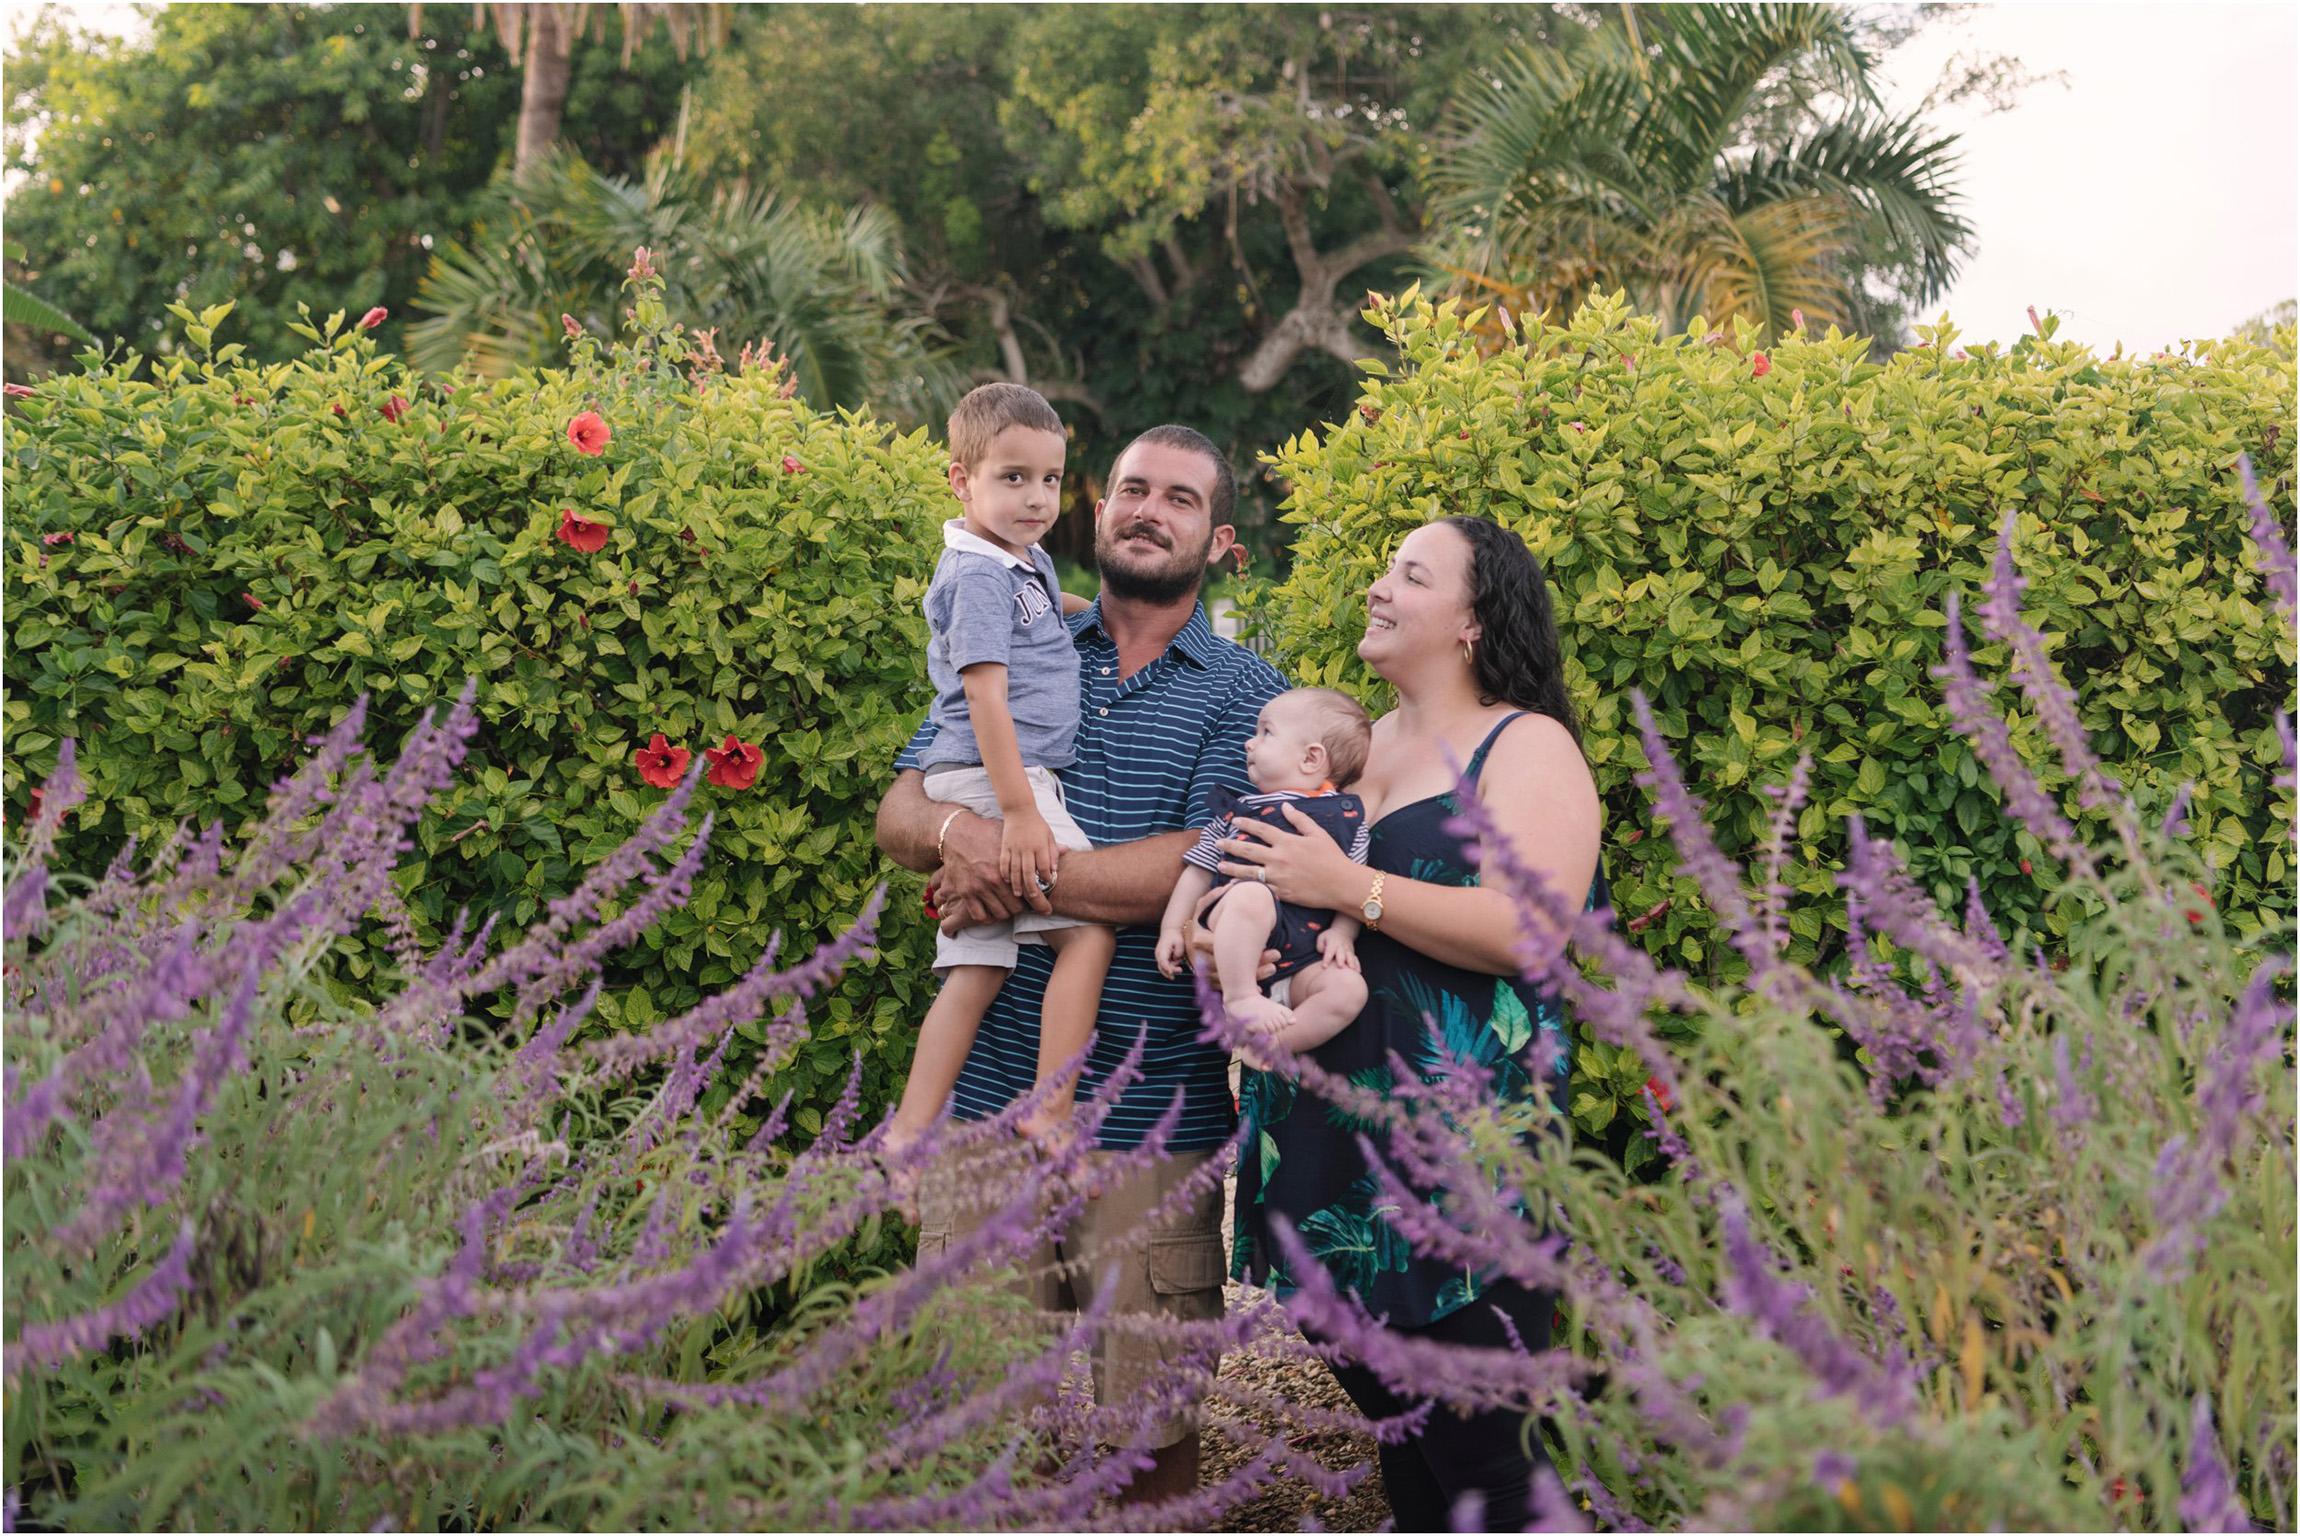 ©FianderFoto_Bermuda Family Photogarpher_Botanical Gardens_Amaro_002.jpg